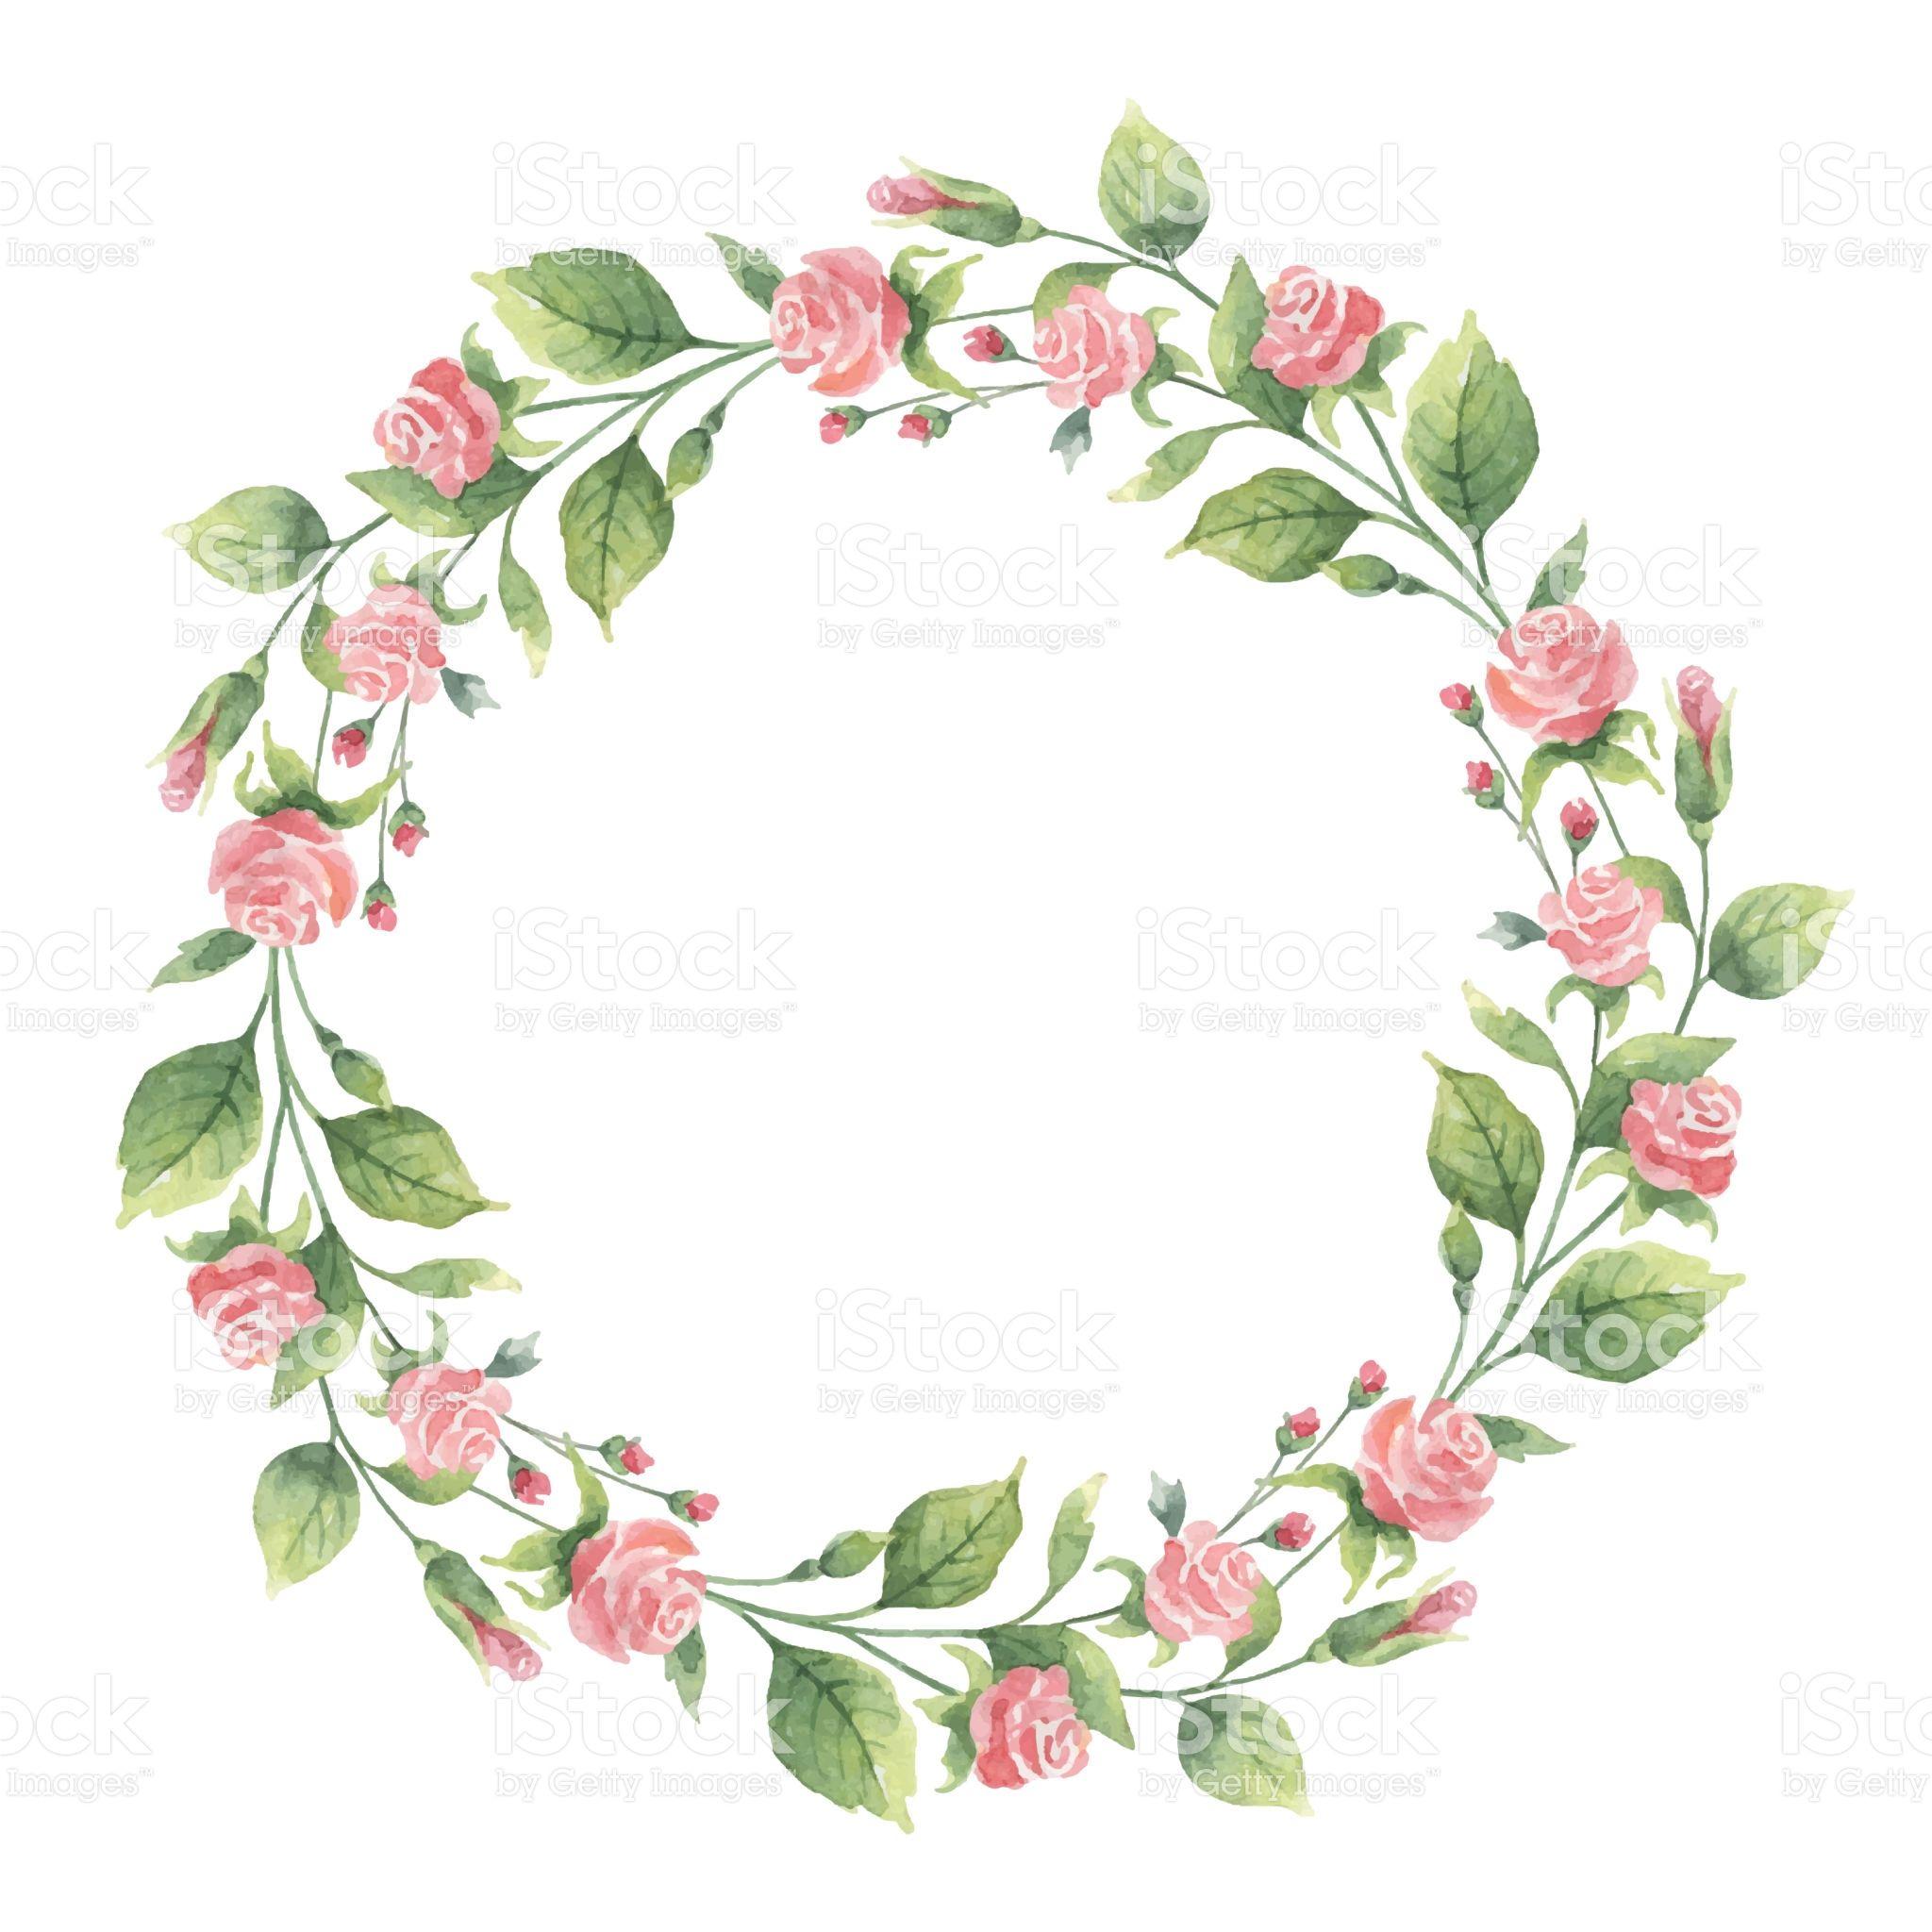 Wreath of flowers 94